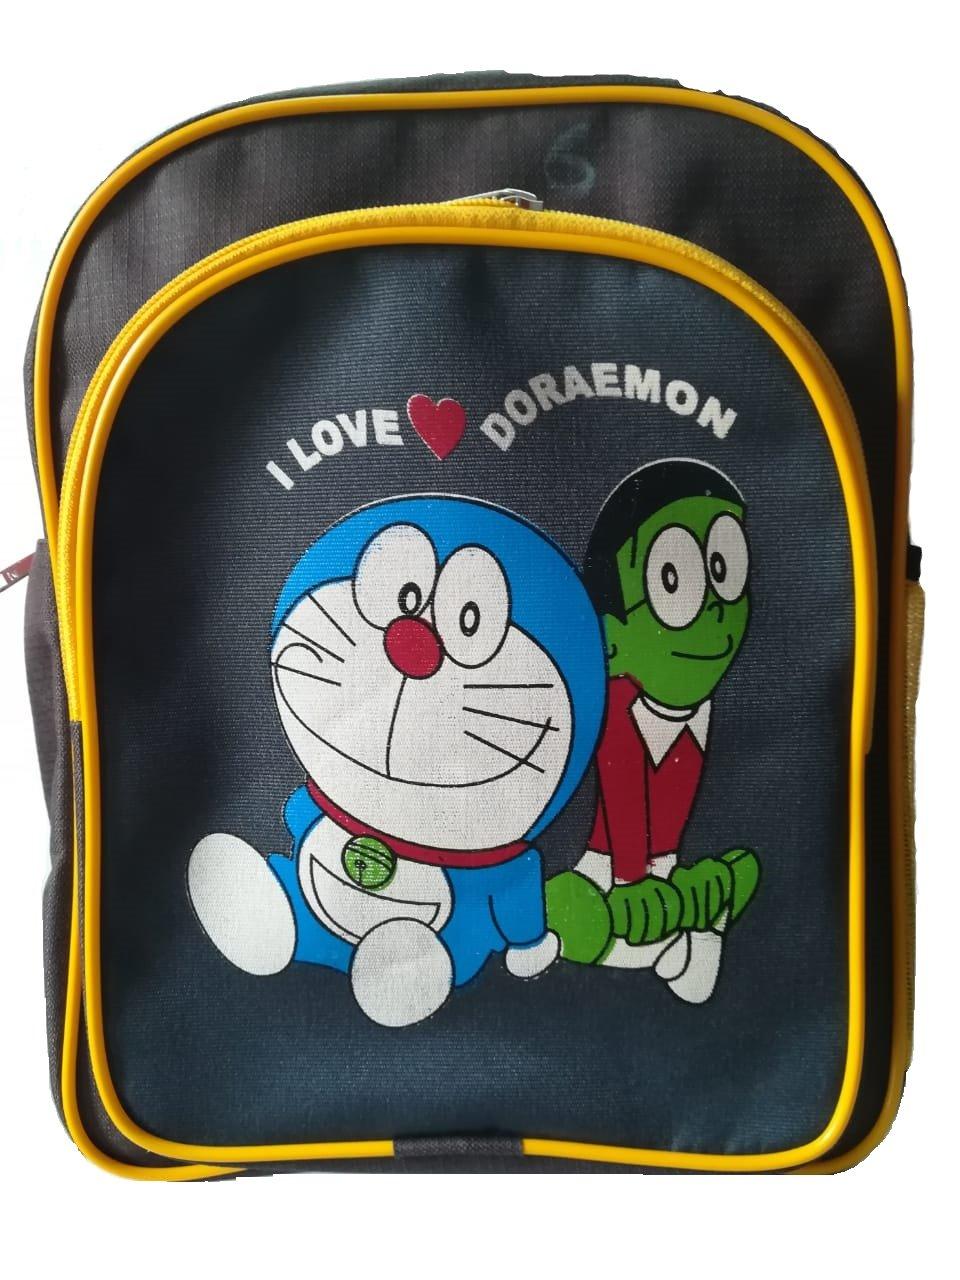 Star Cartoon Characters School Bag for Kids